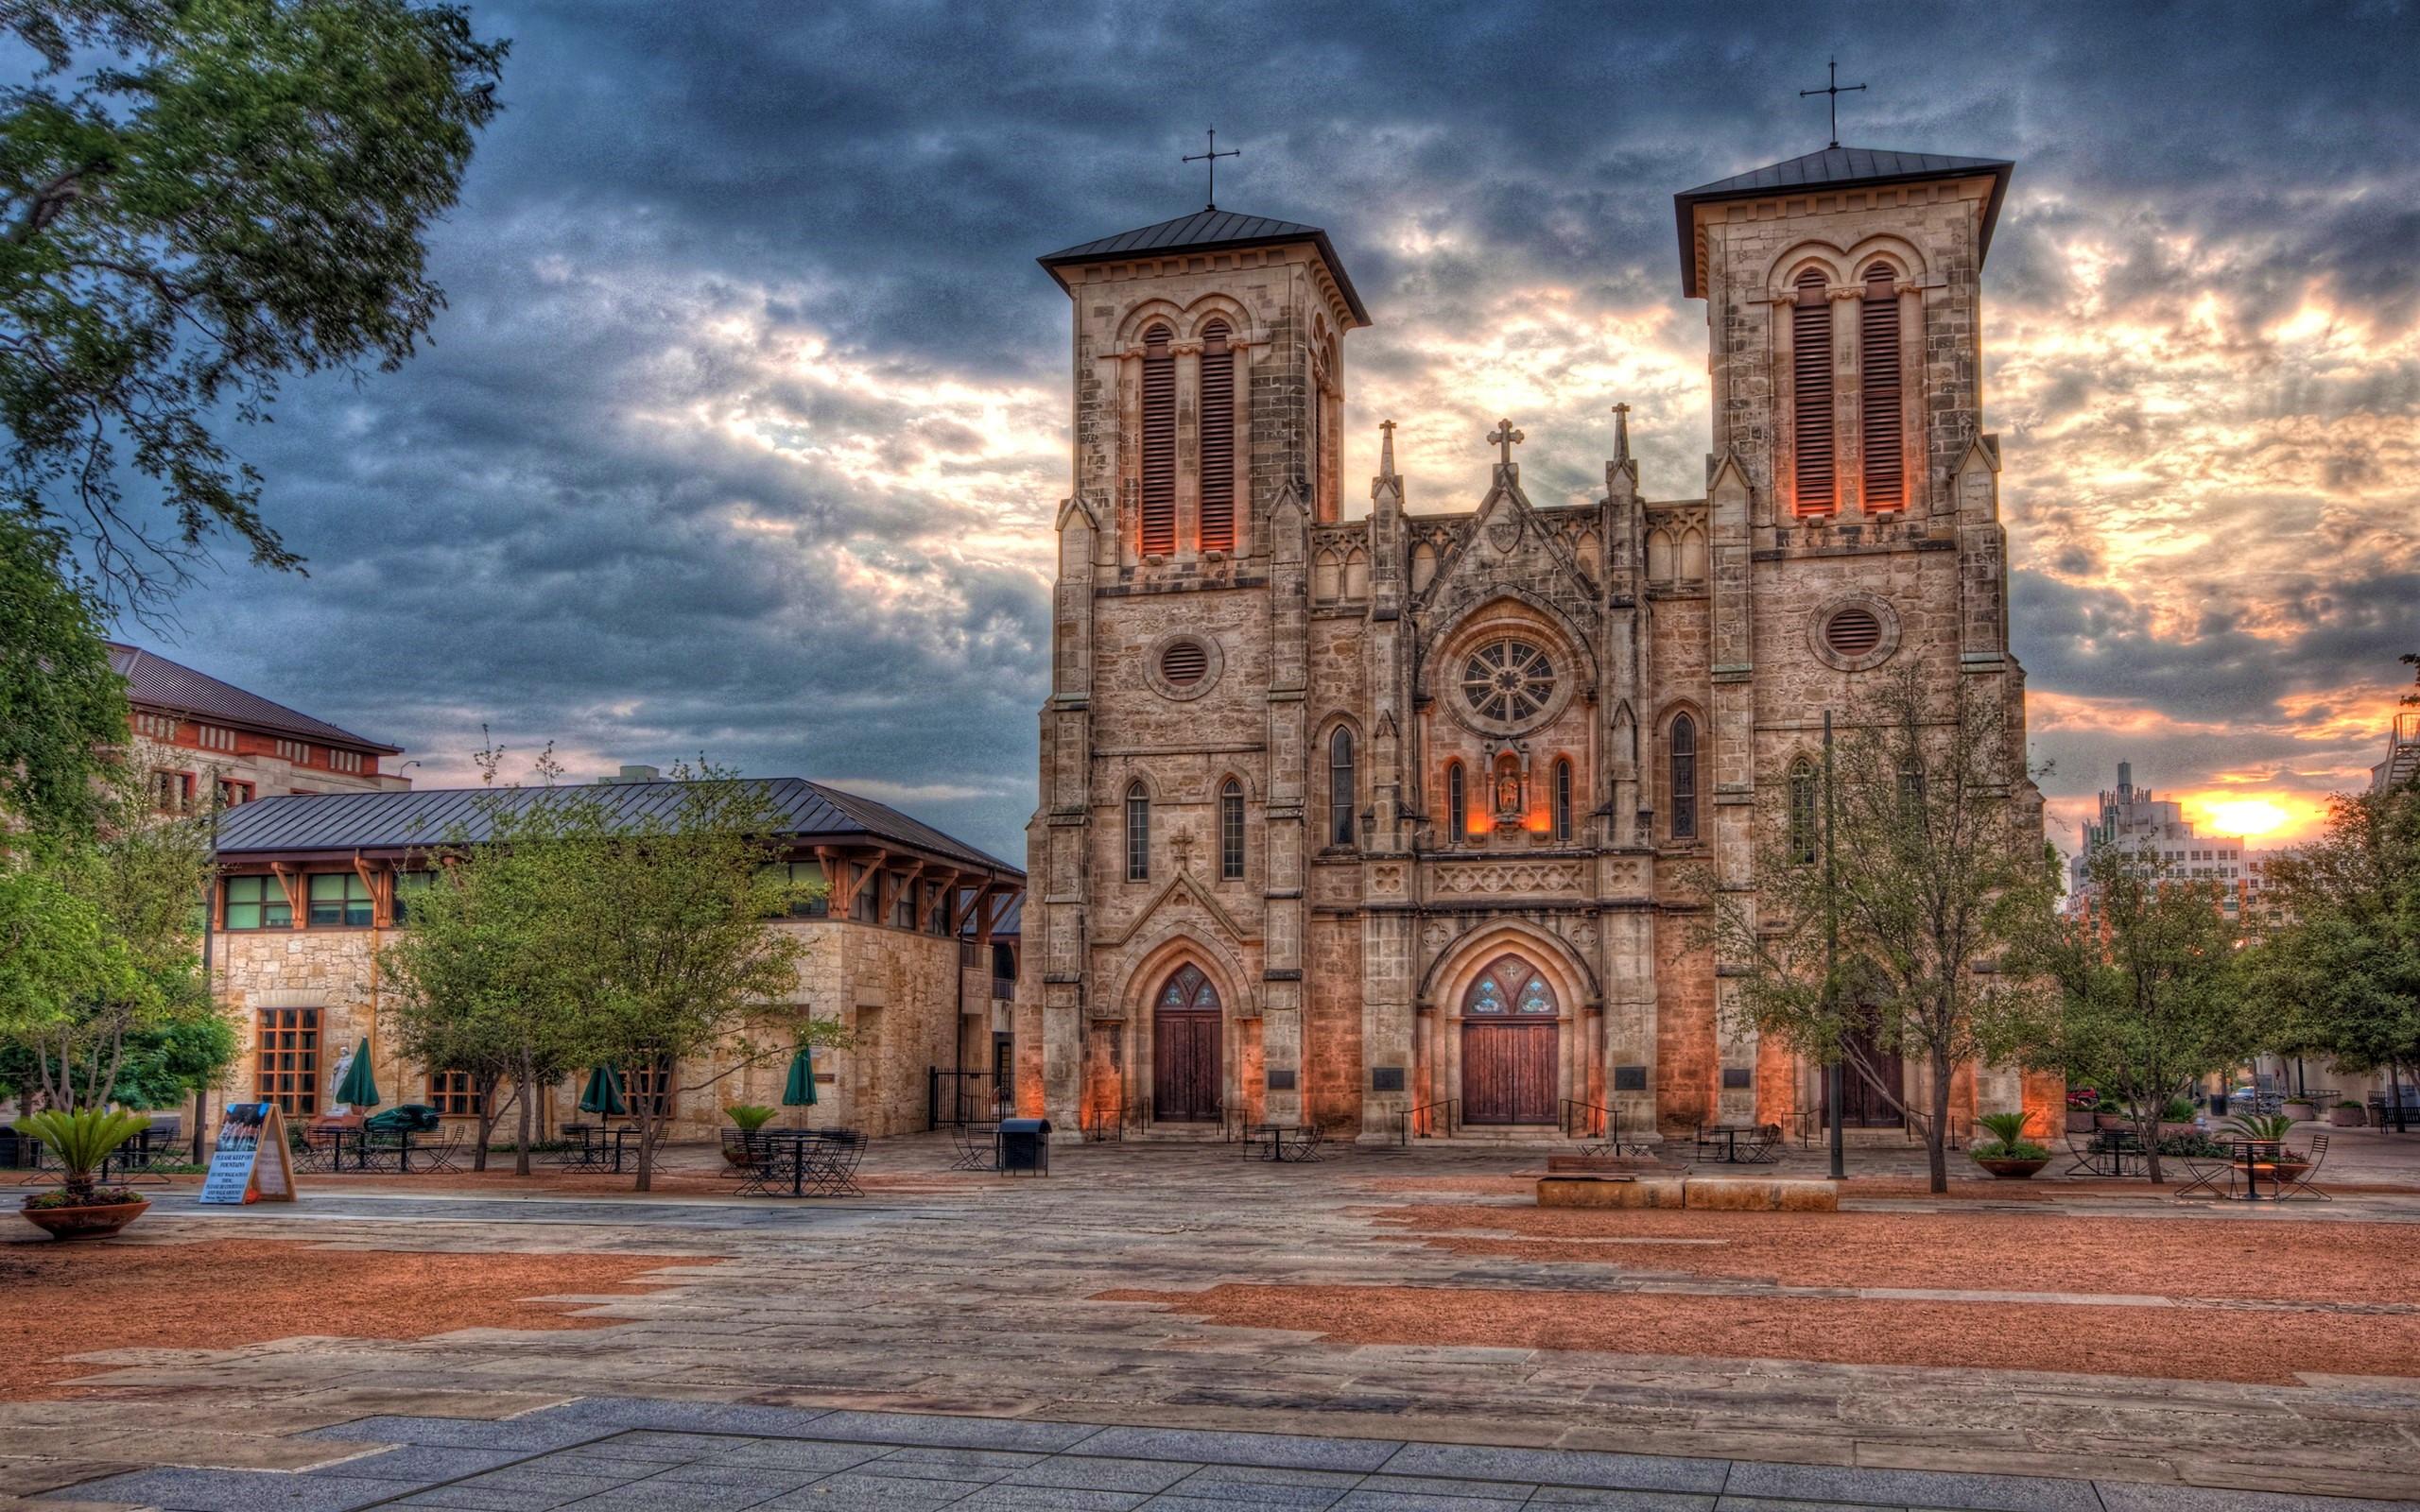 Hd Lavender Wallpaper San Fernando Cathedral In San Antonio Texas Usa Hd